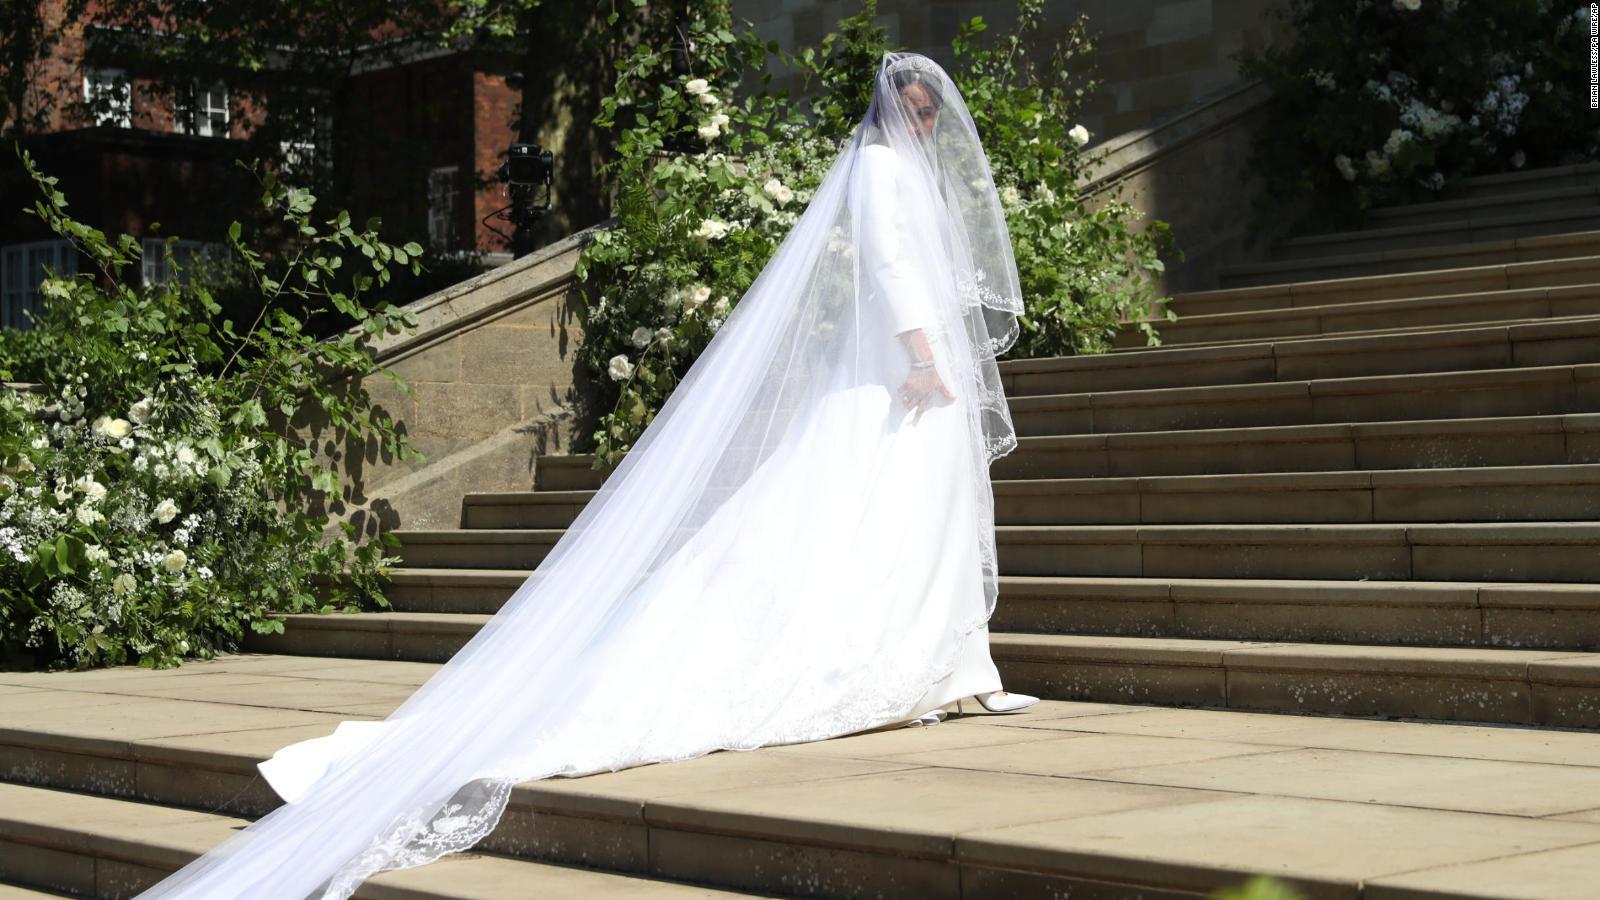 meghan duchess of sussex s wedding dress on display cnn style meghan duchess of sussex s wedding